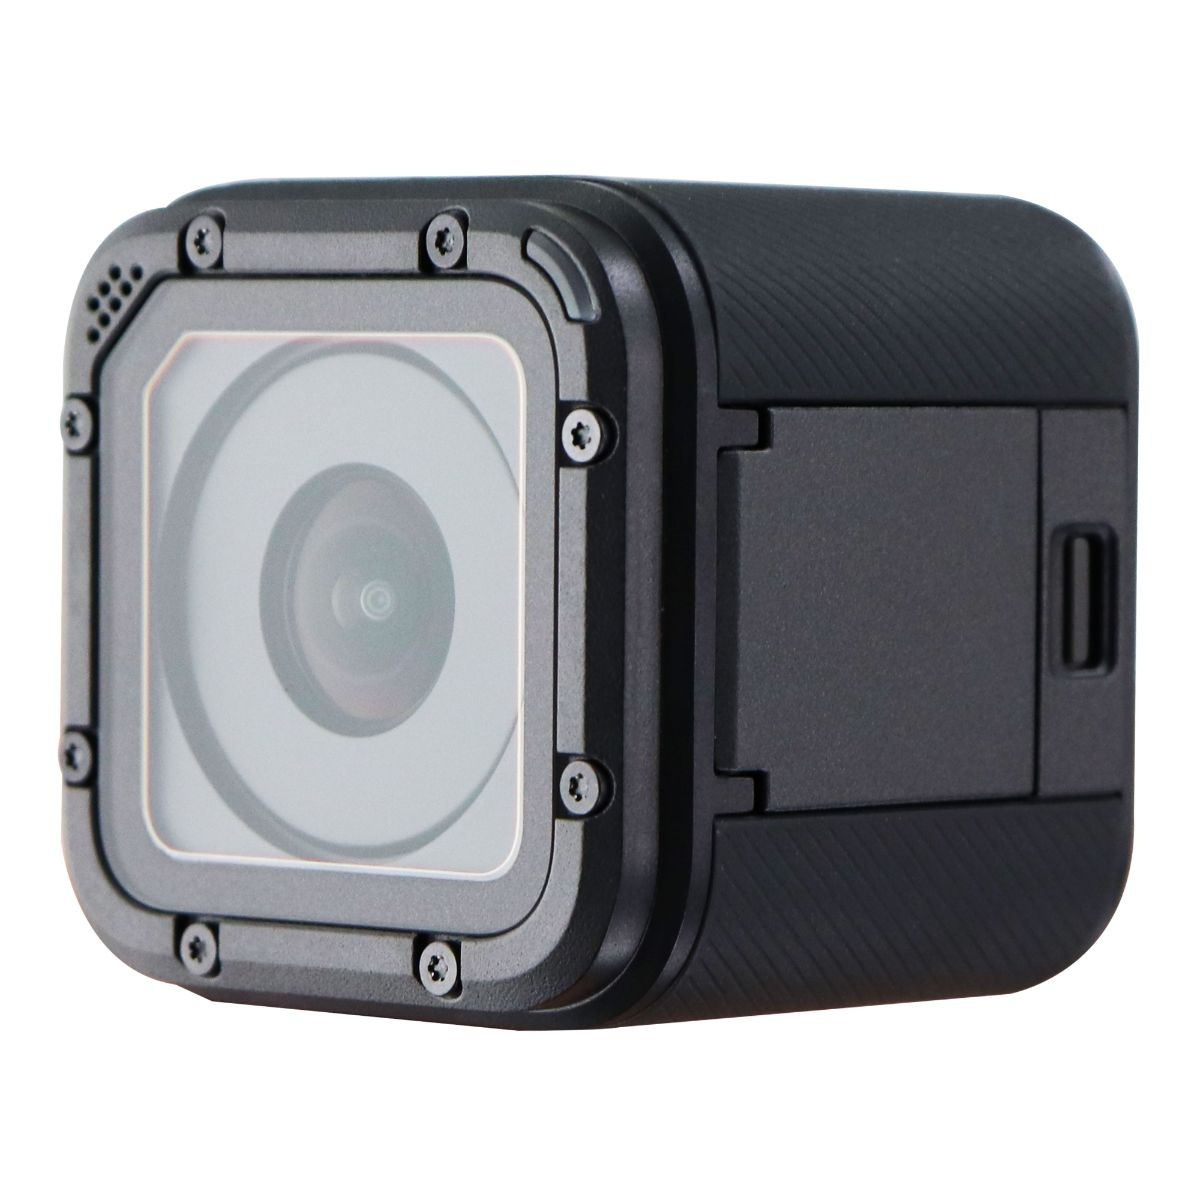 GoPro HERO5 Session 4K Action Camera - Black (CHDHS-501)